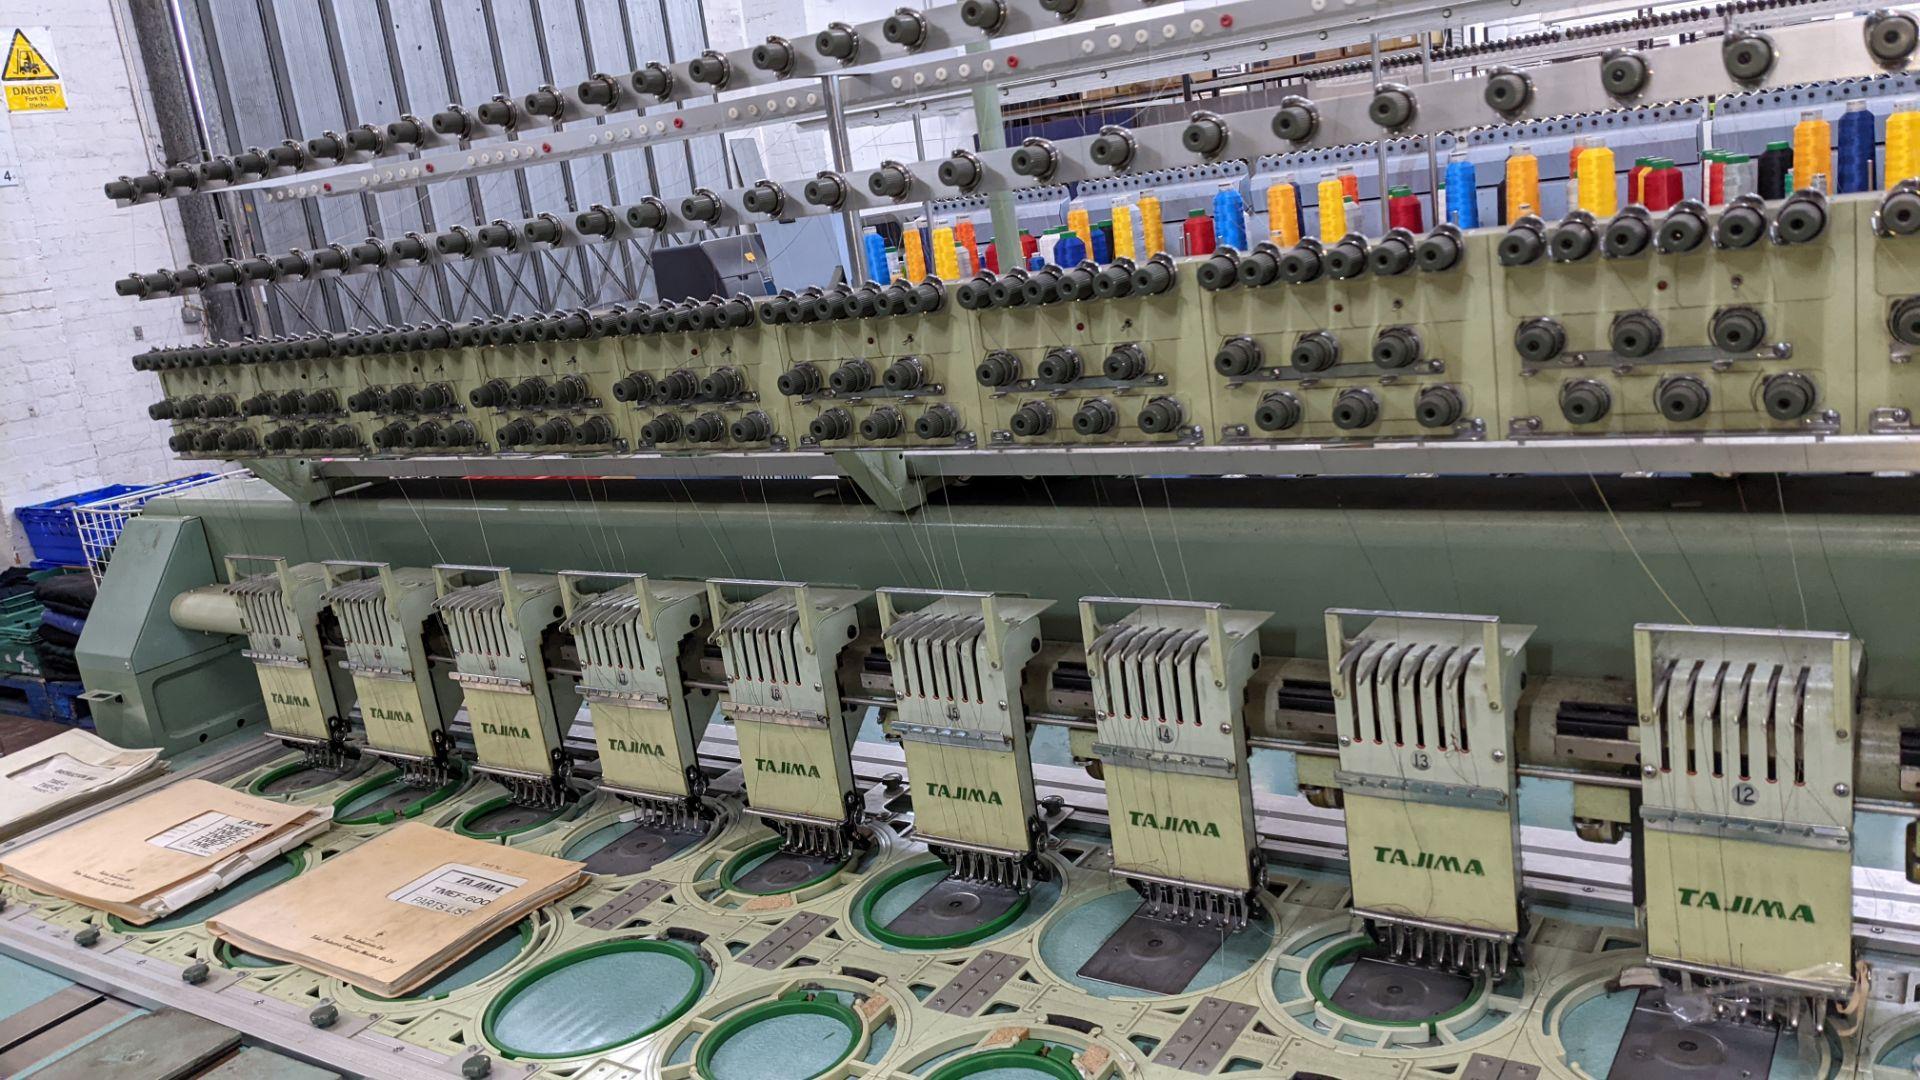 Tokai Tajima electronic 20 head automatic embroidery machine model TMEF-H620 - Image 10 of 25